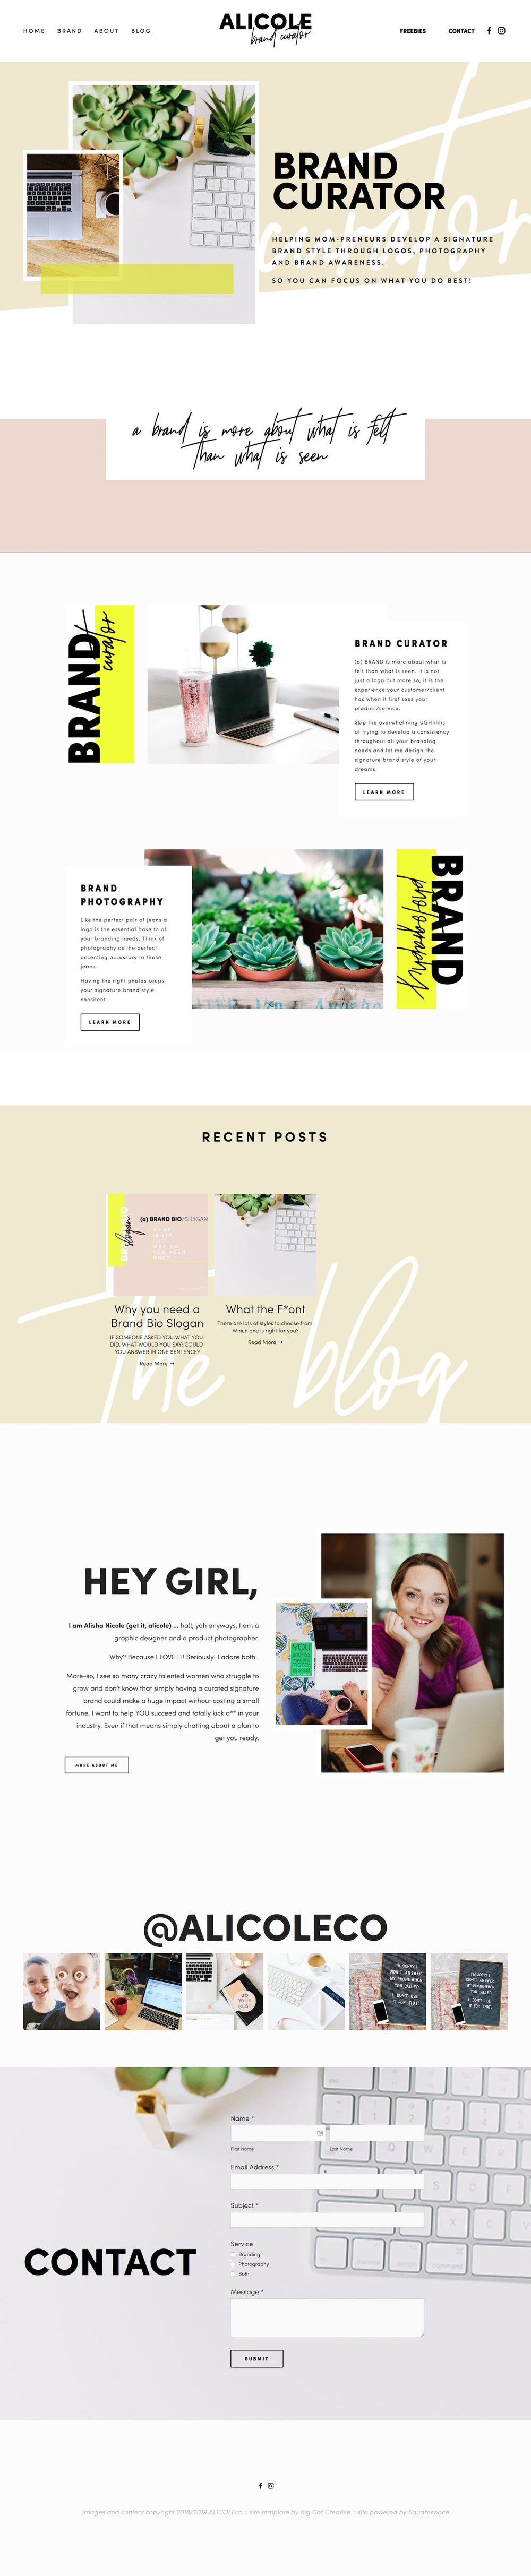 Big-Cat-Creative-Squarespace-Website-Templates---Alicole.jpg